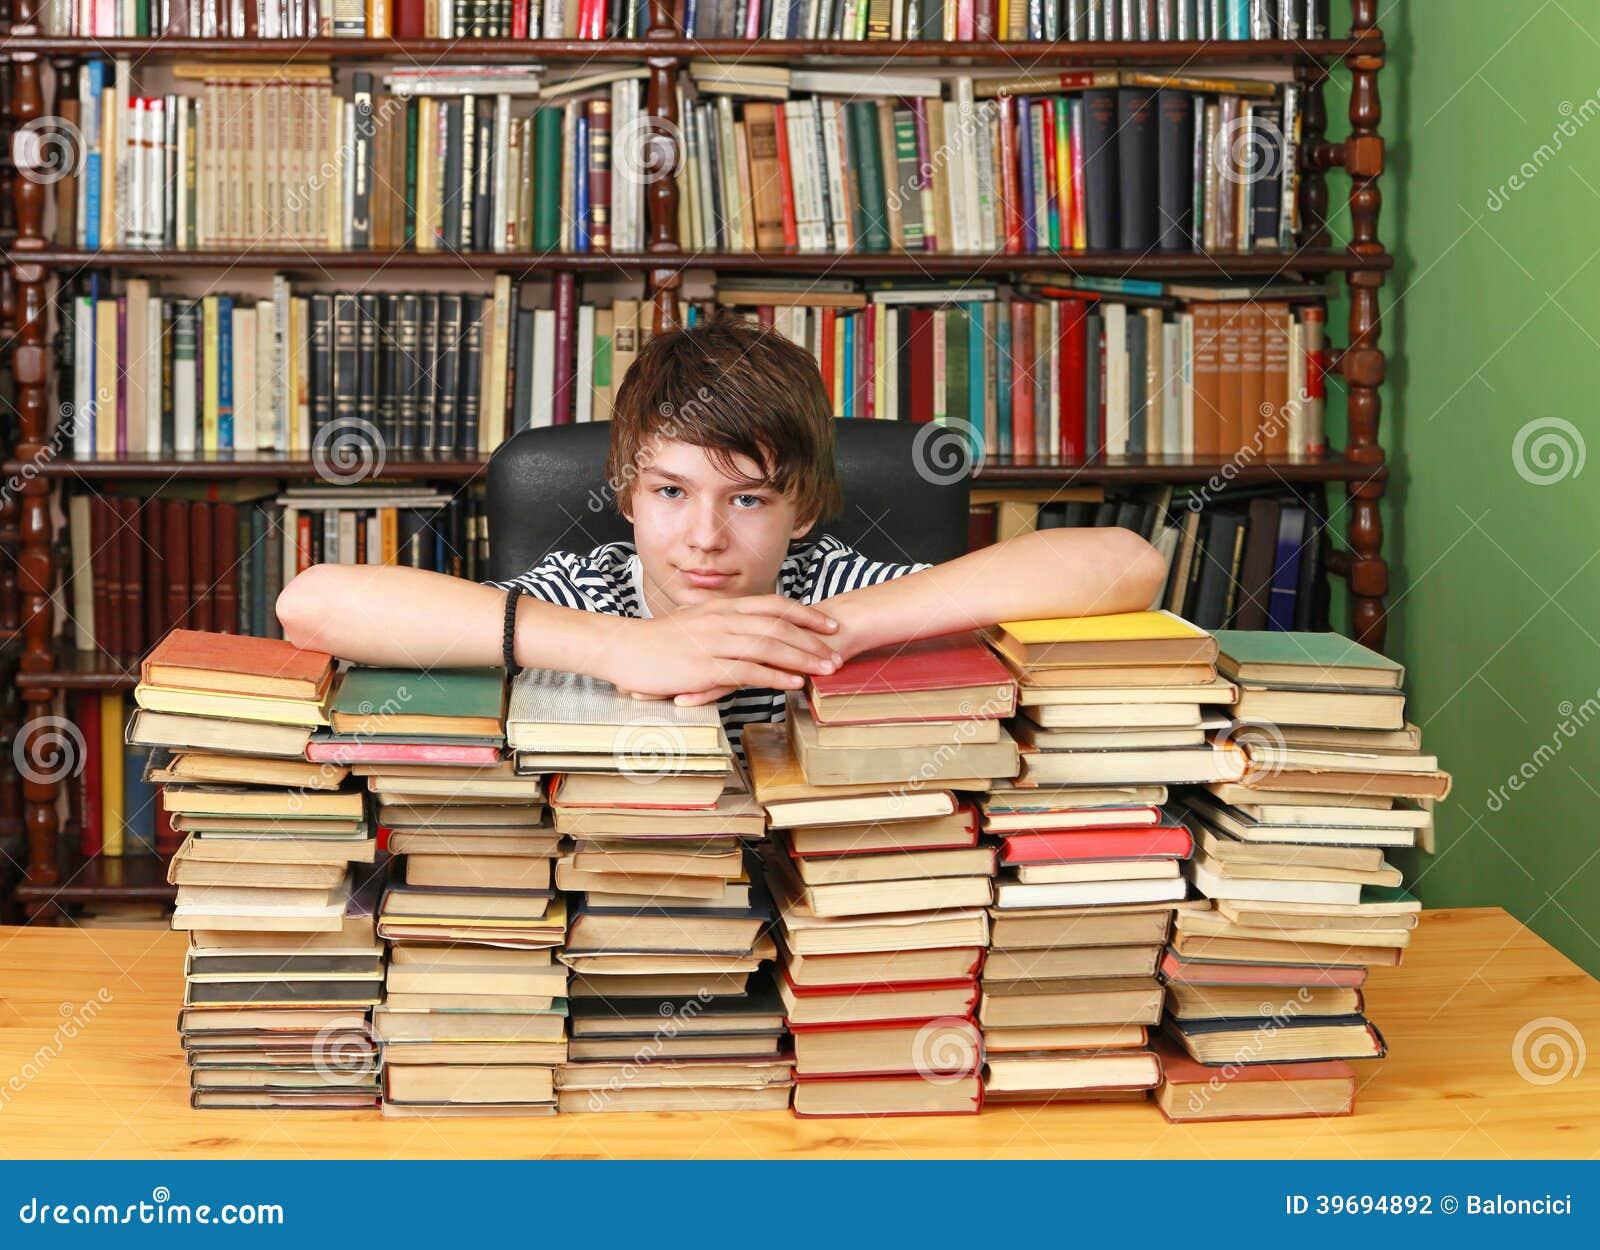 pile of books teen - photo #22